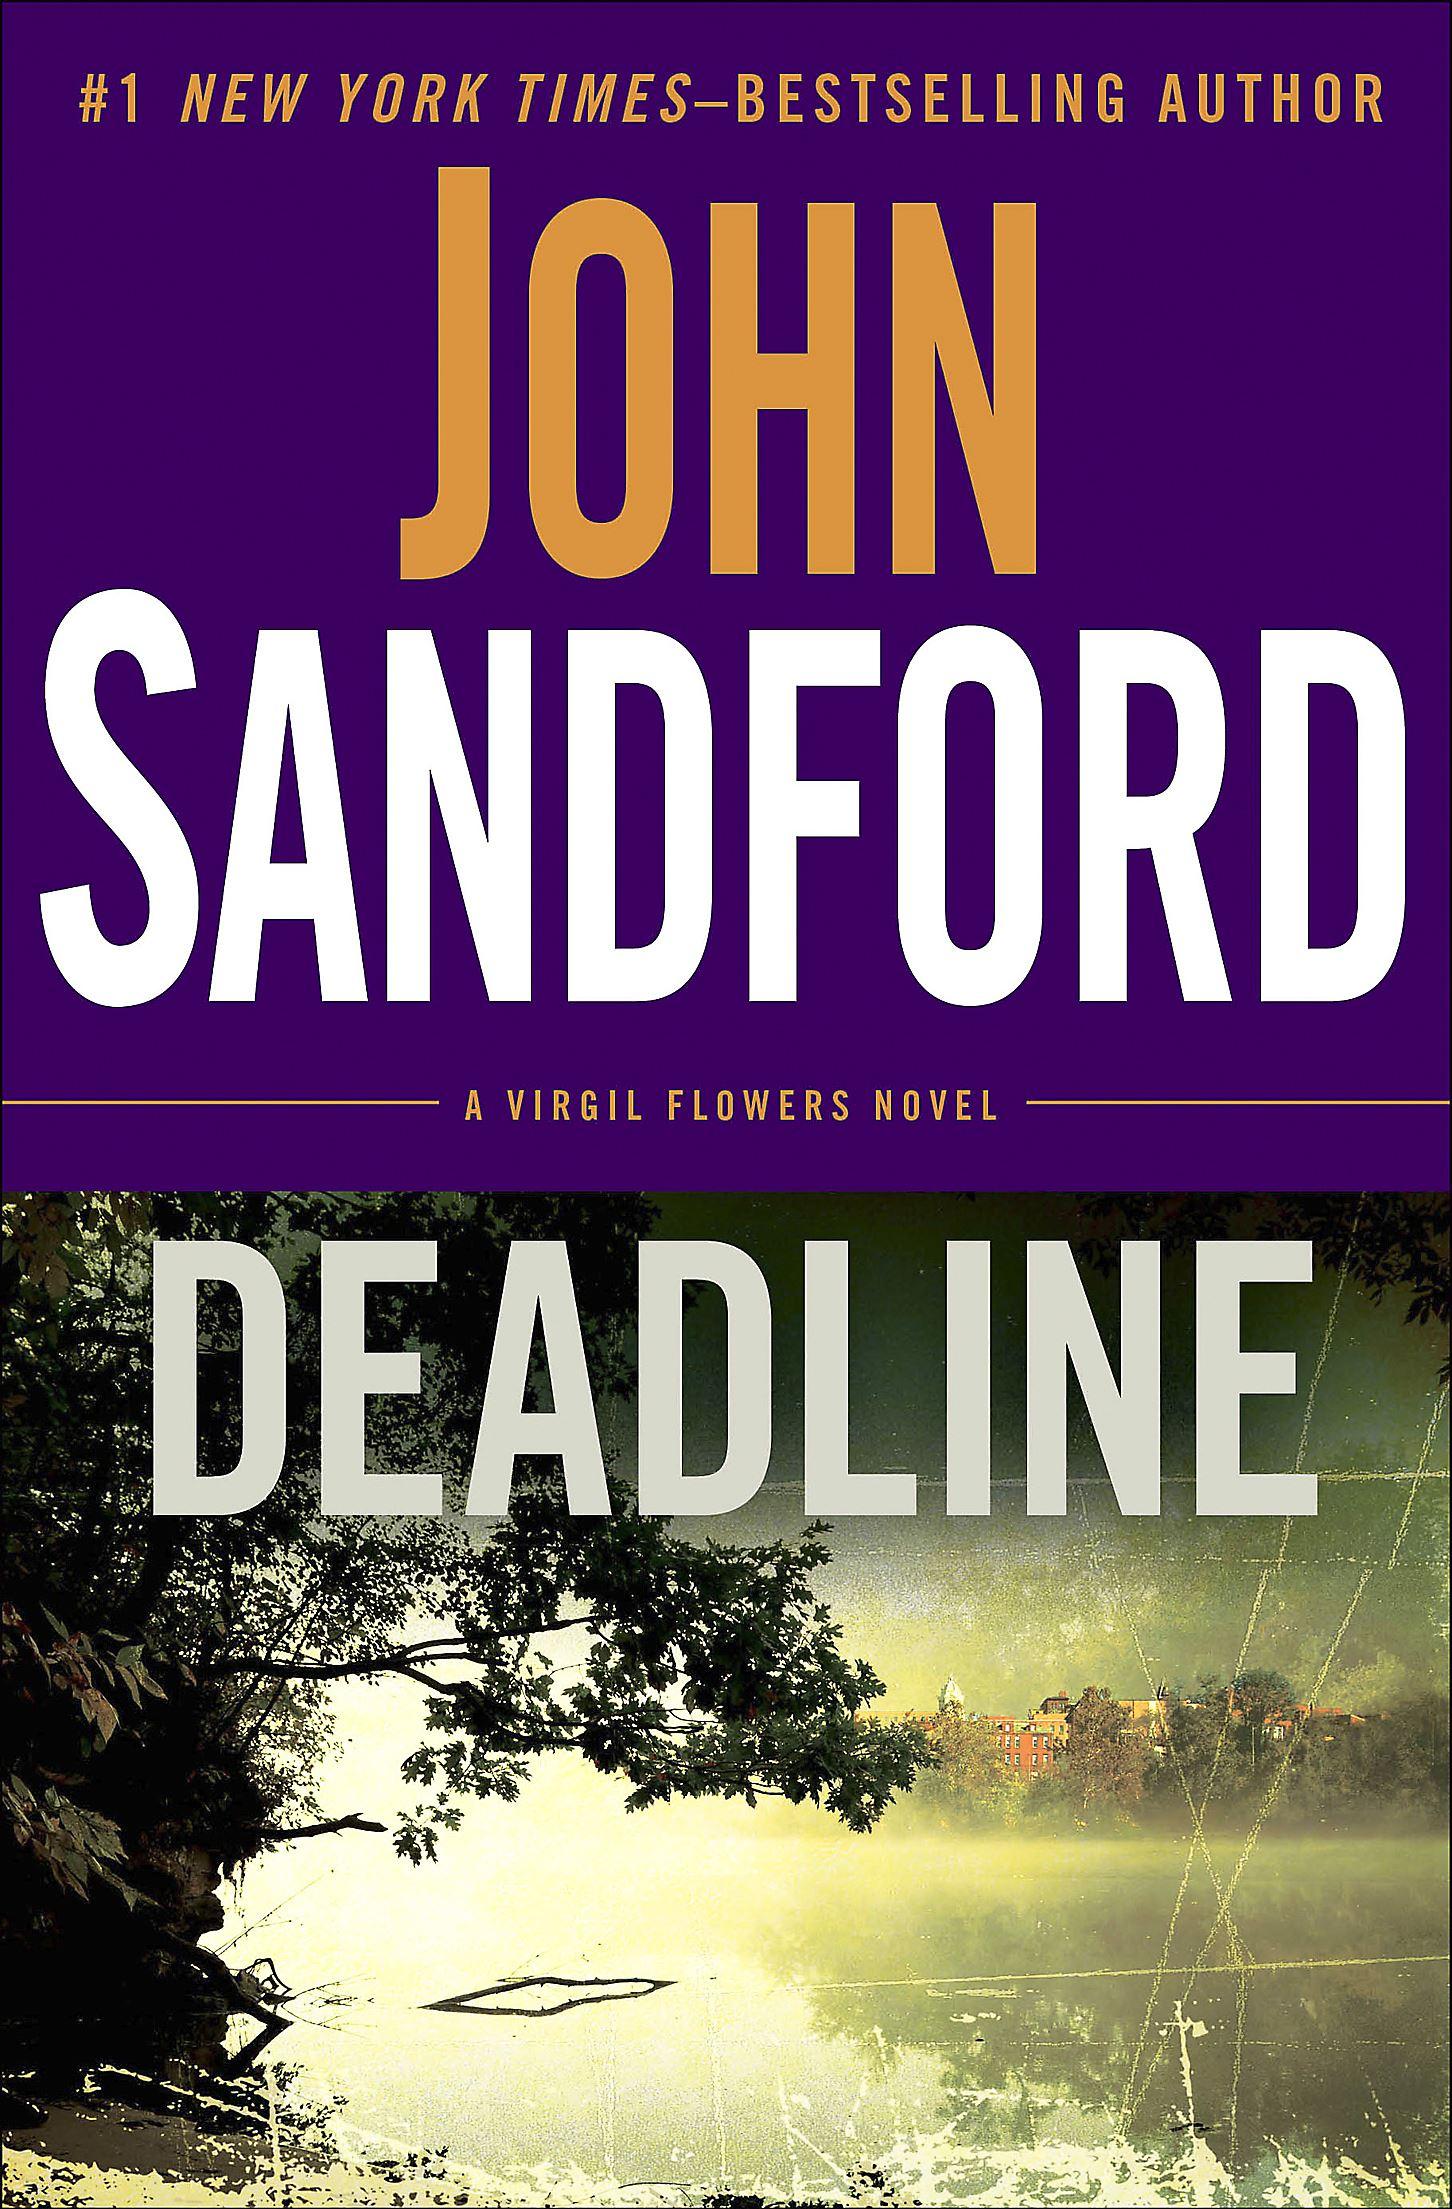 Deadline A seedy reporter is murdered in John Sandford's latest Vi